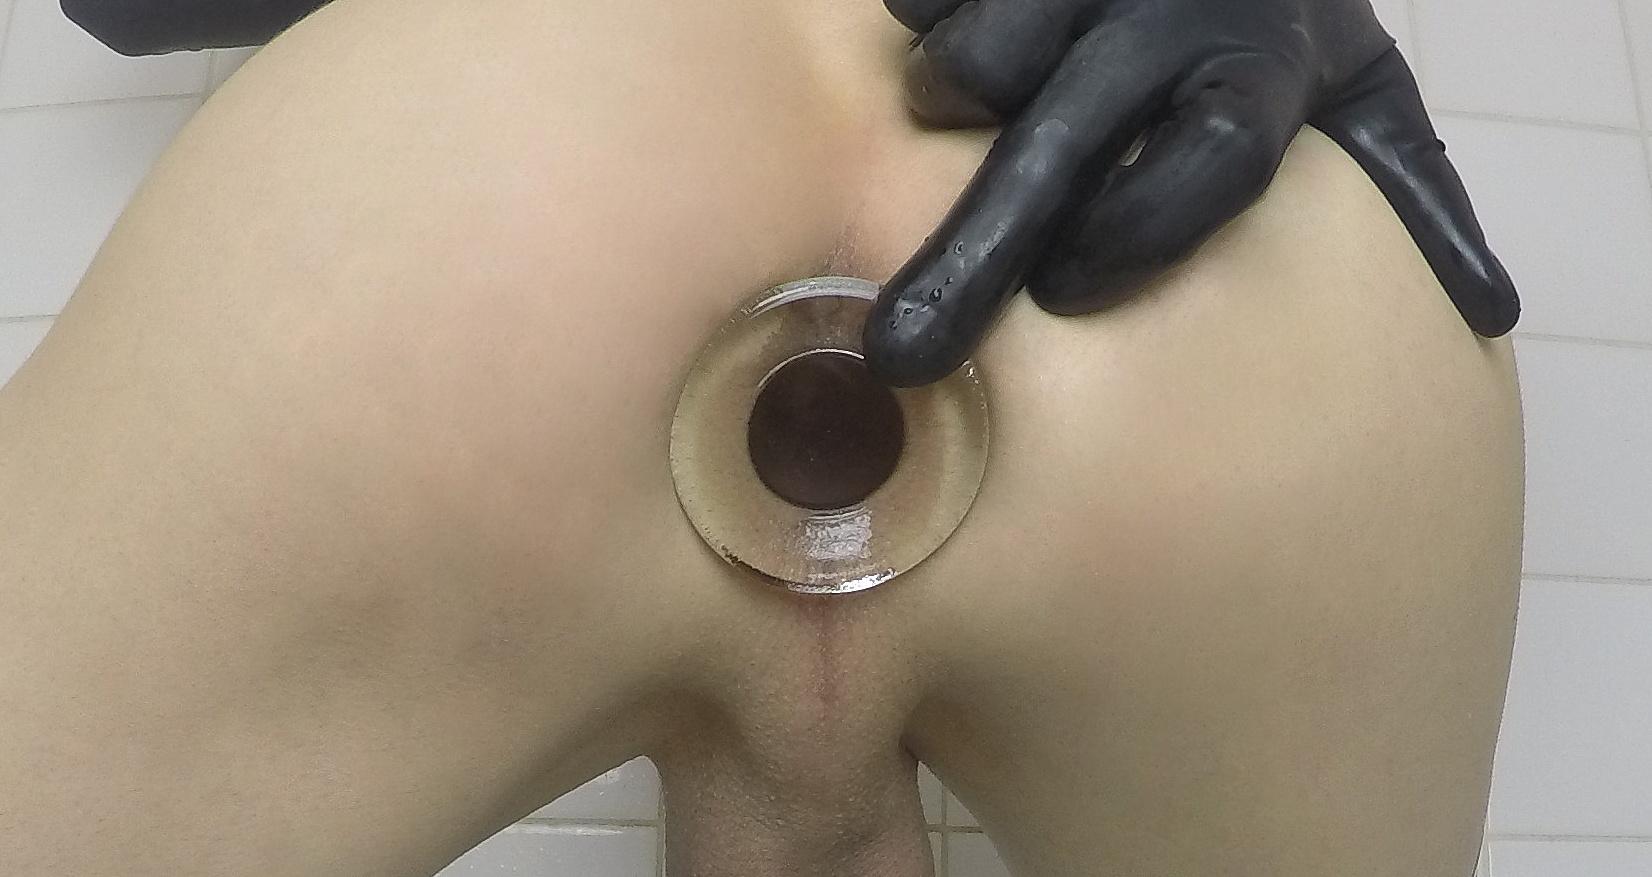 bauer fickt nichte adult porn tube watch and download